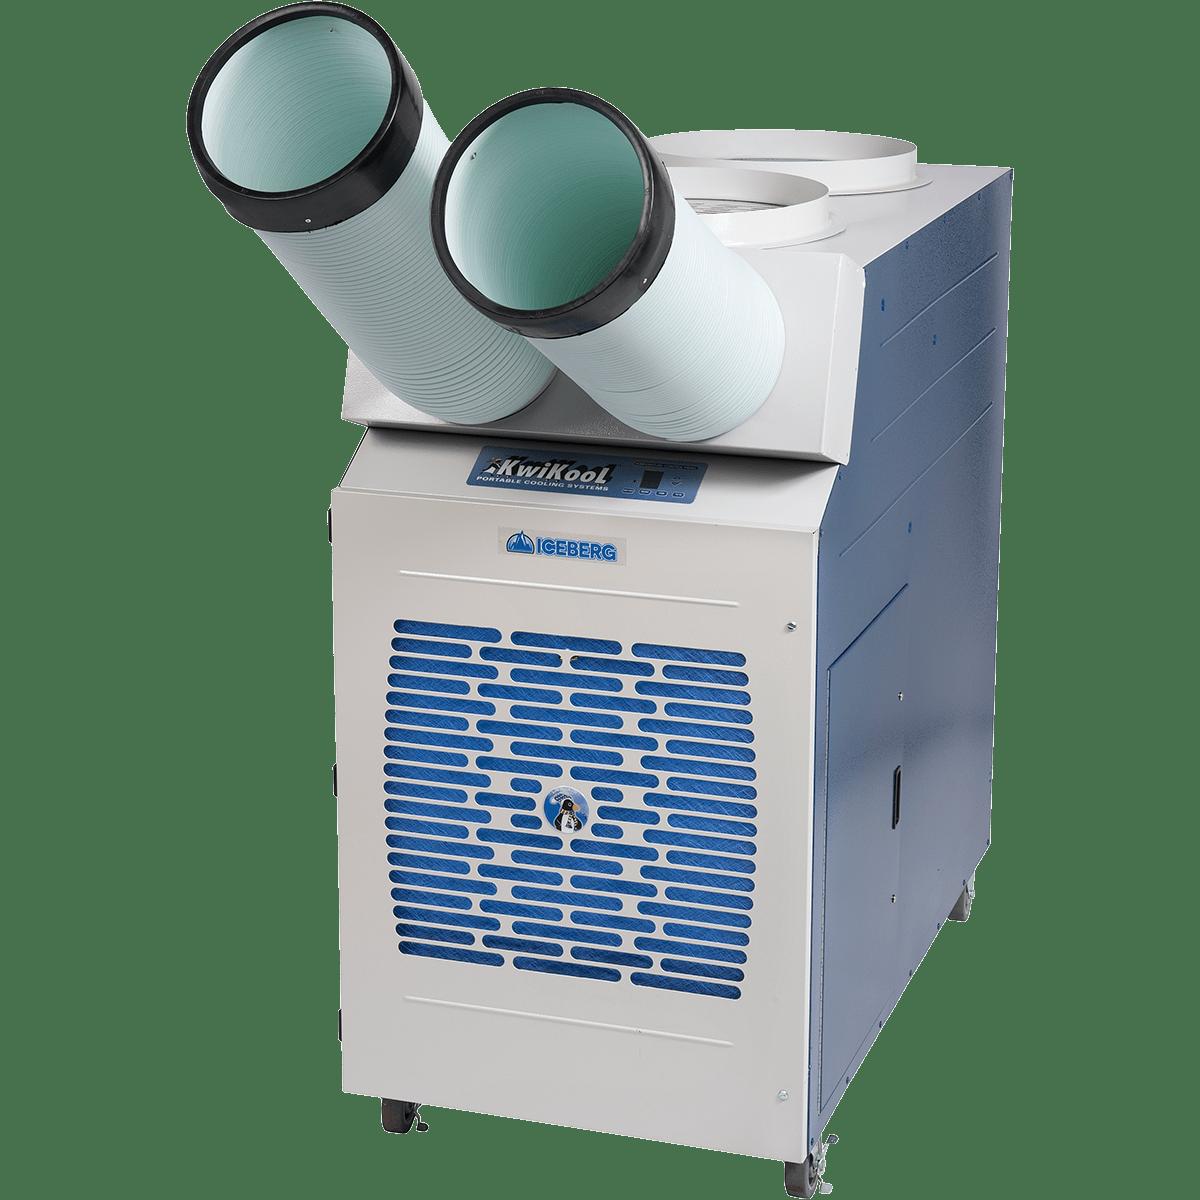 KwiKool 60,000 BTU 5-Ton Portable Air Conditioners